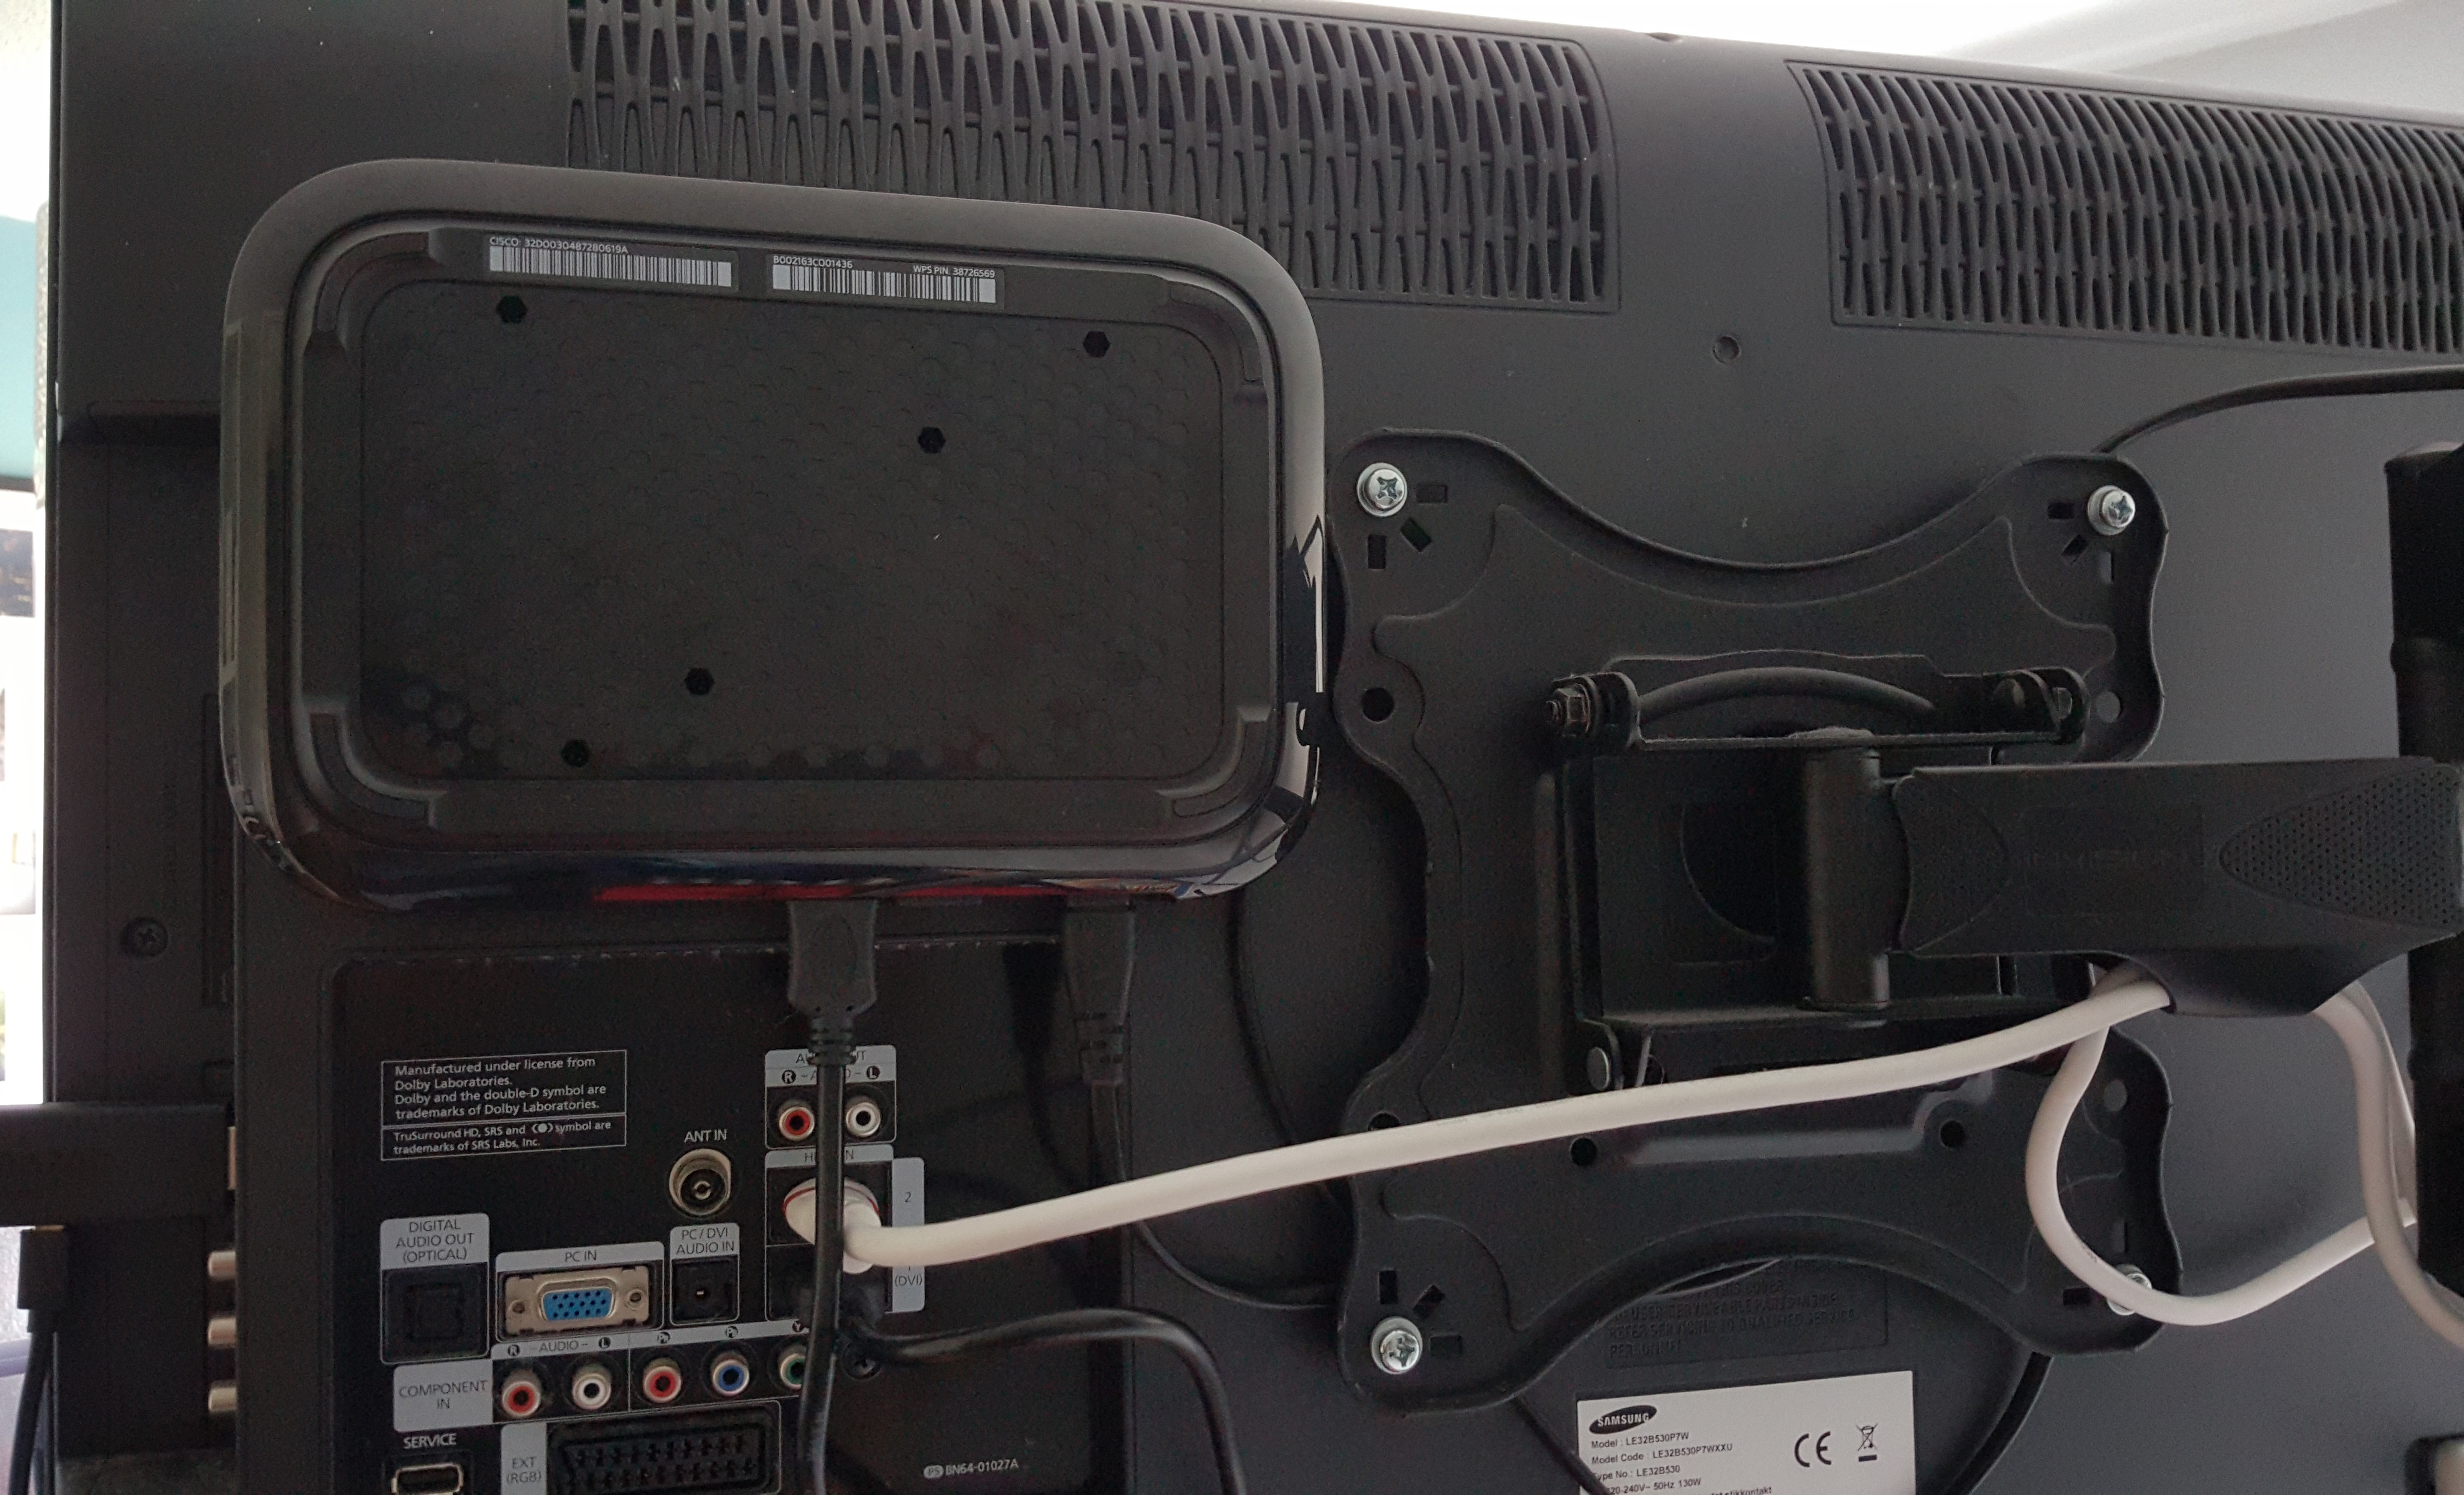 How To Tv Mount Your Sky Q Mini Box Kip Hakes